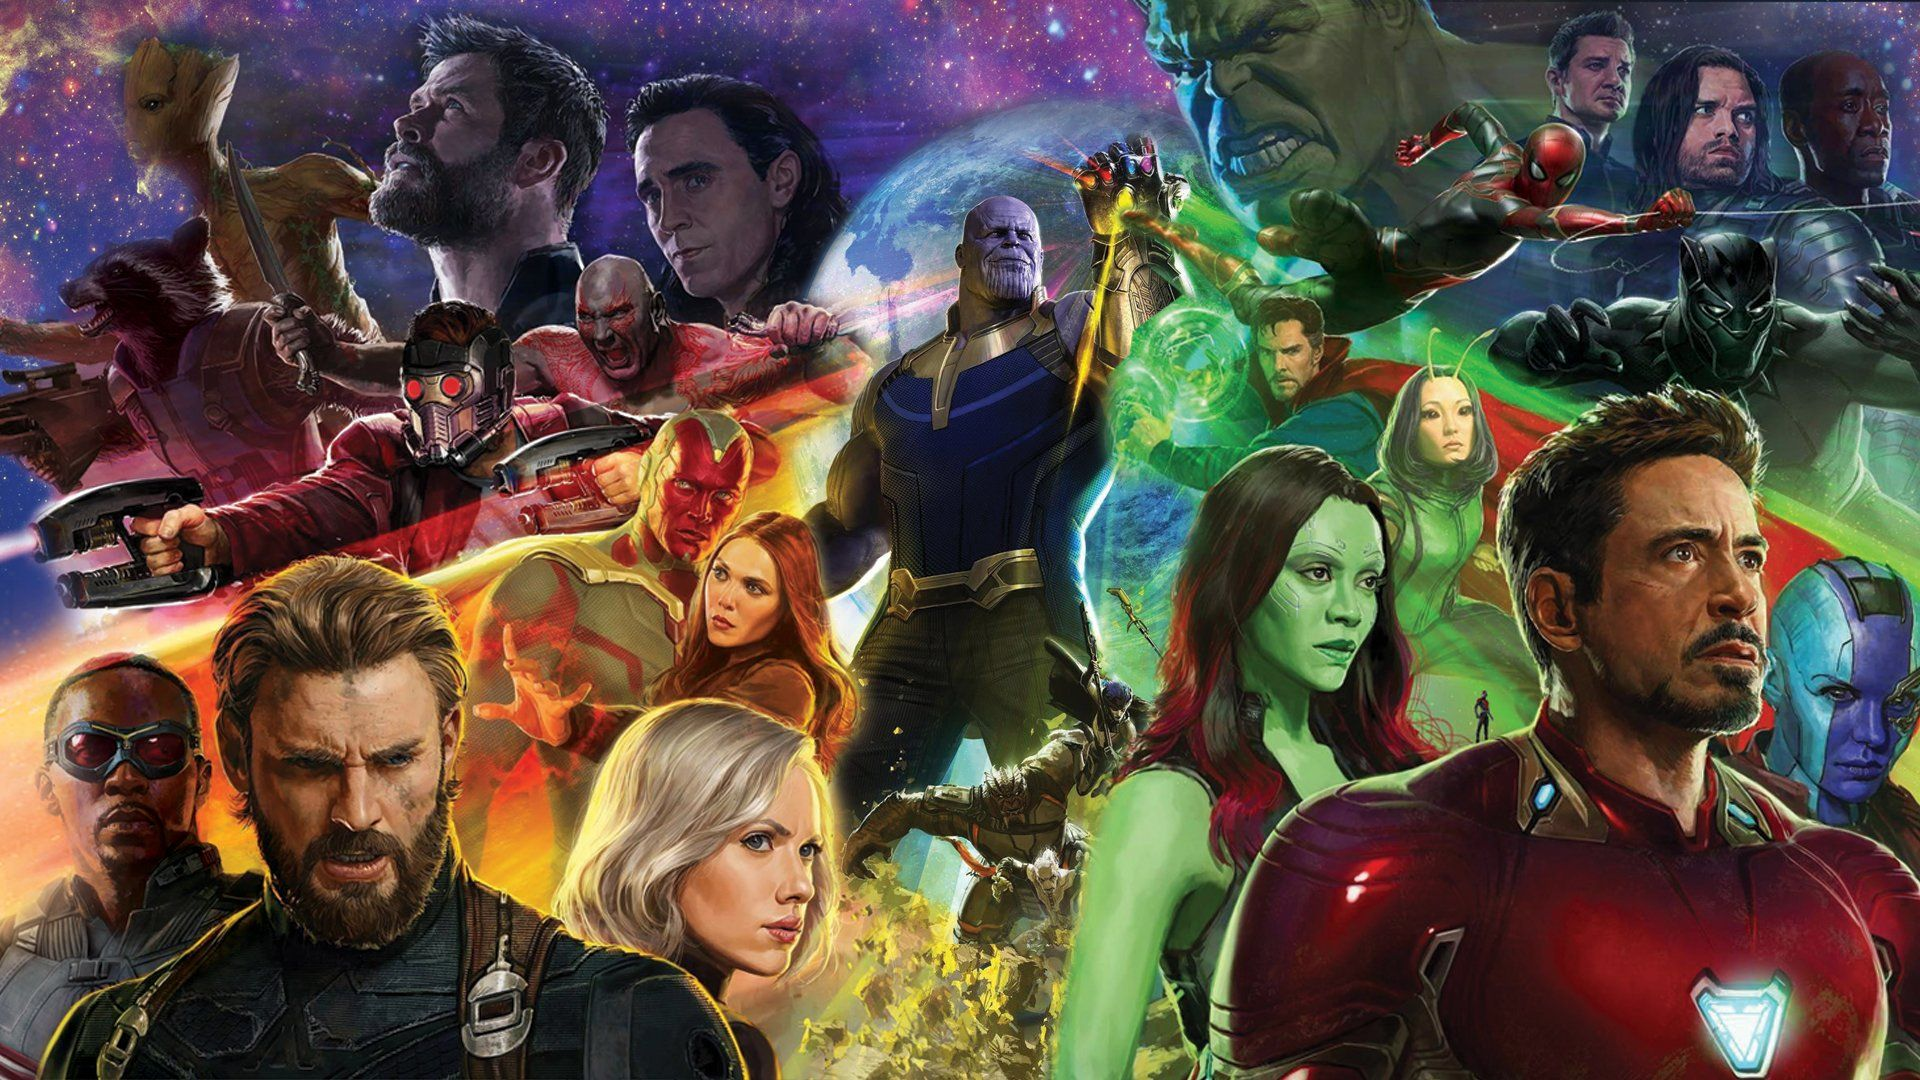 Avengers Infinity War 1920 X 1080 Wallpapers Top Free Avengers